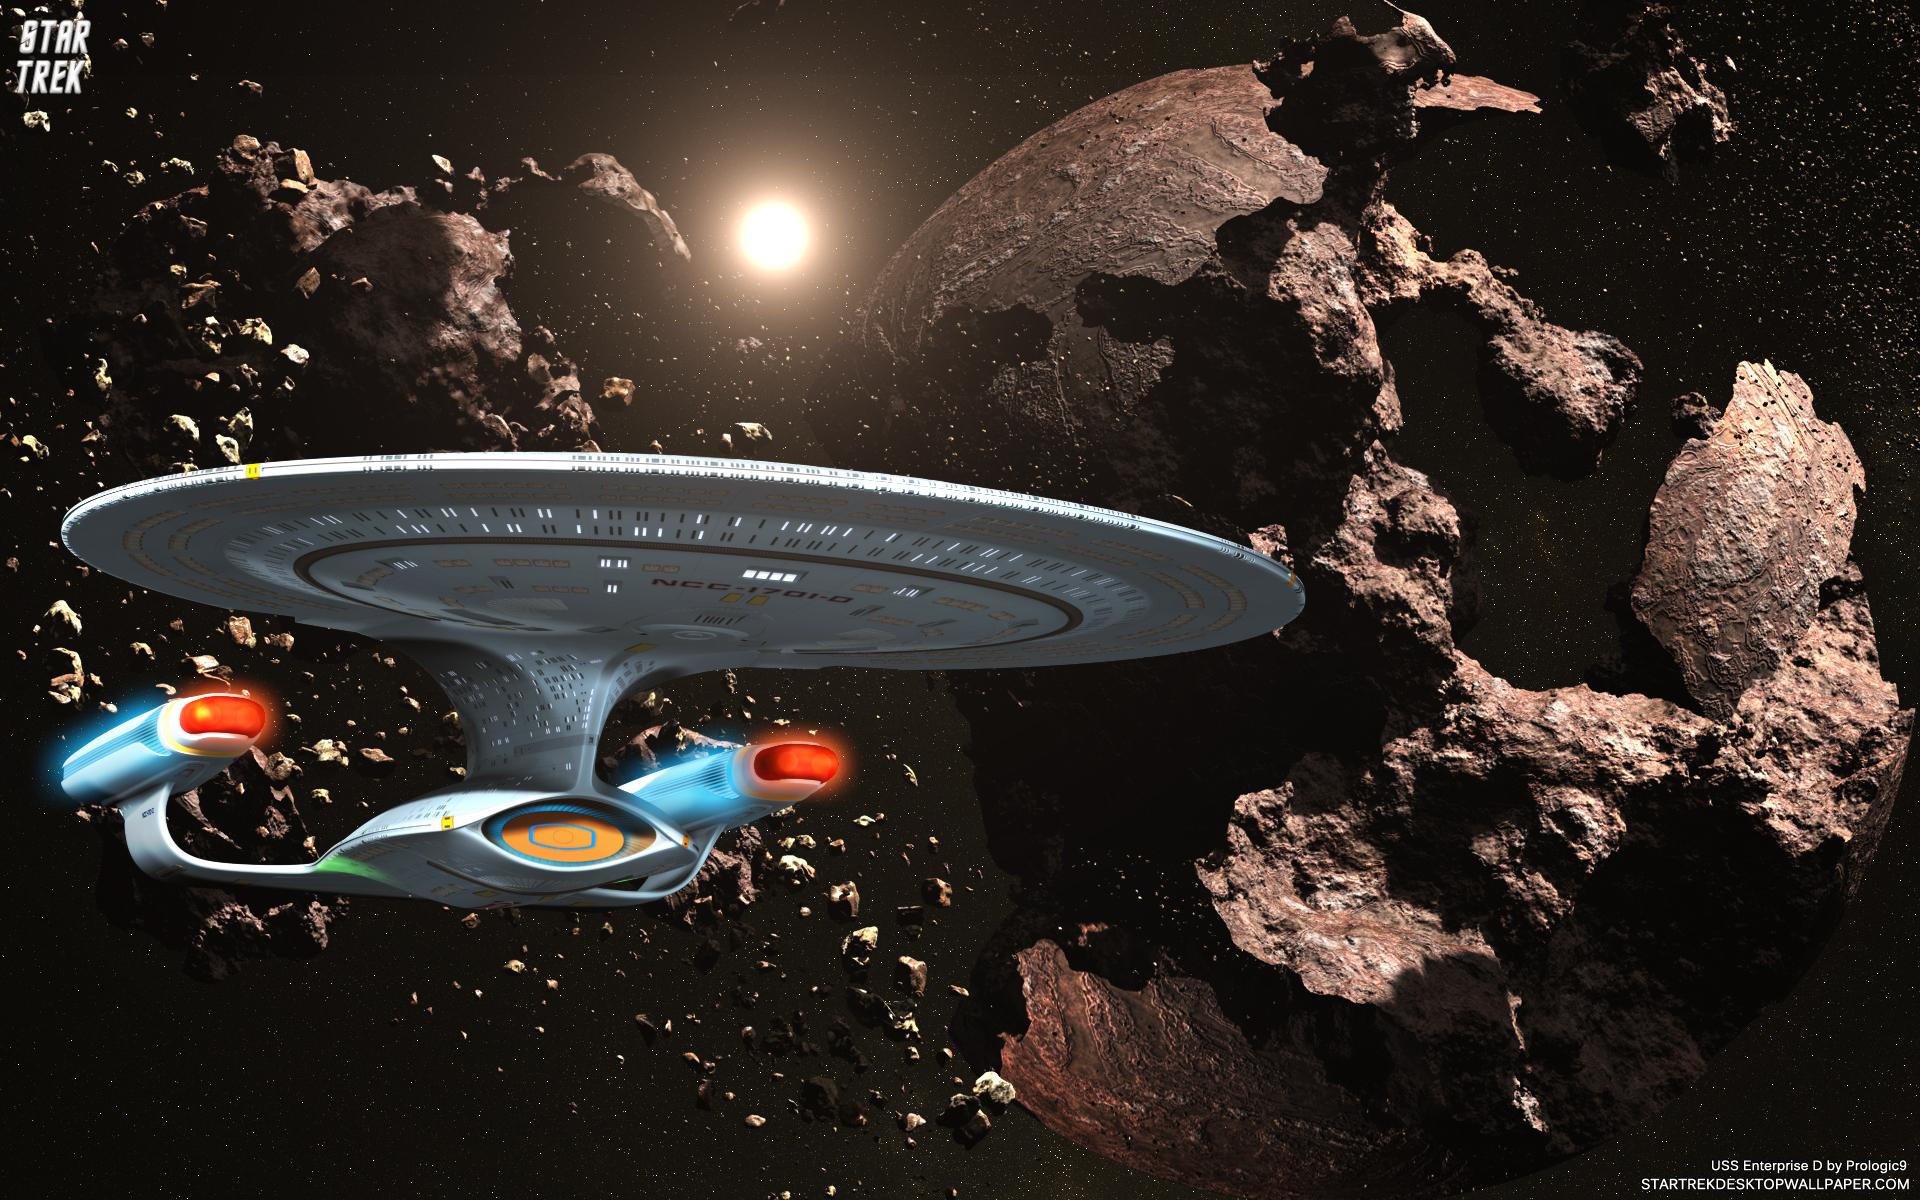 Free download Star Trek Enterprise D wallpaper 21 [21x21 ...